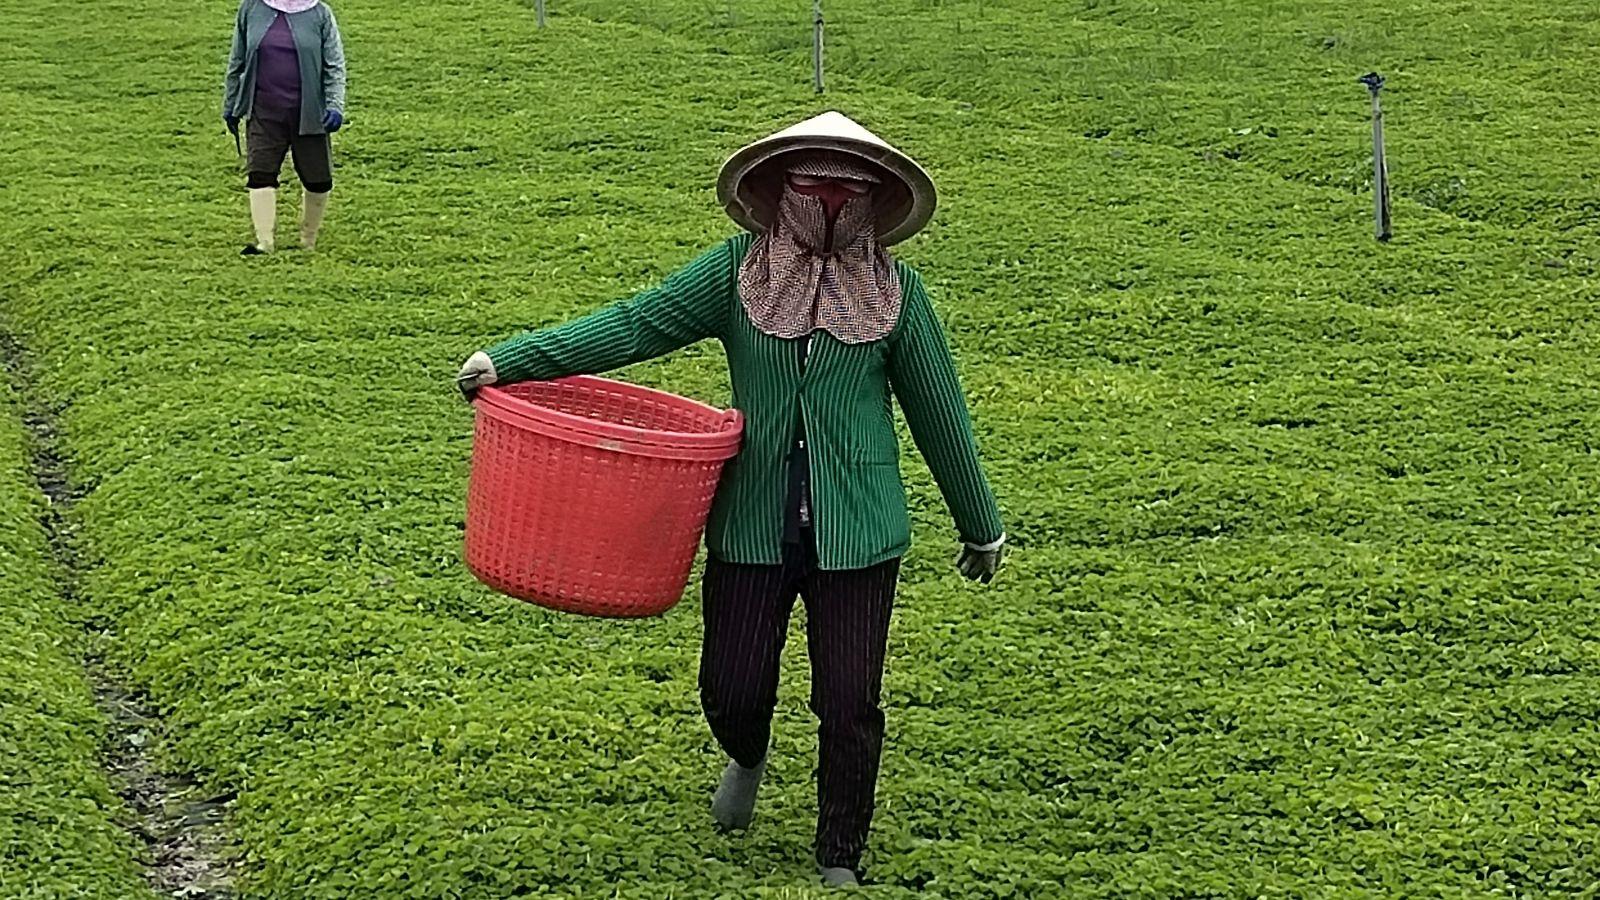 https://baolongan.vn/cac-dia-phuong-vung-dong-thap-muoi-s-n-sang-ung-pho-thien-tai-a121361.html